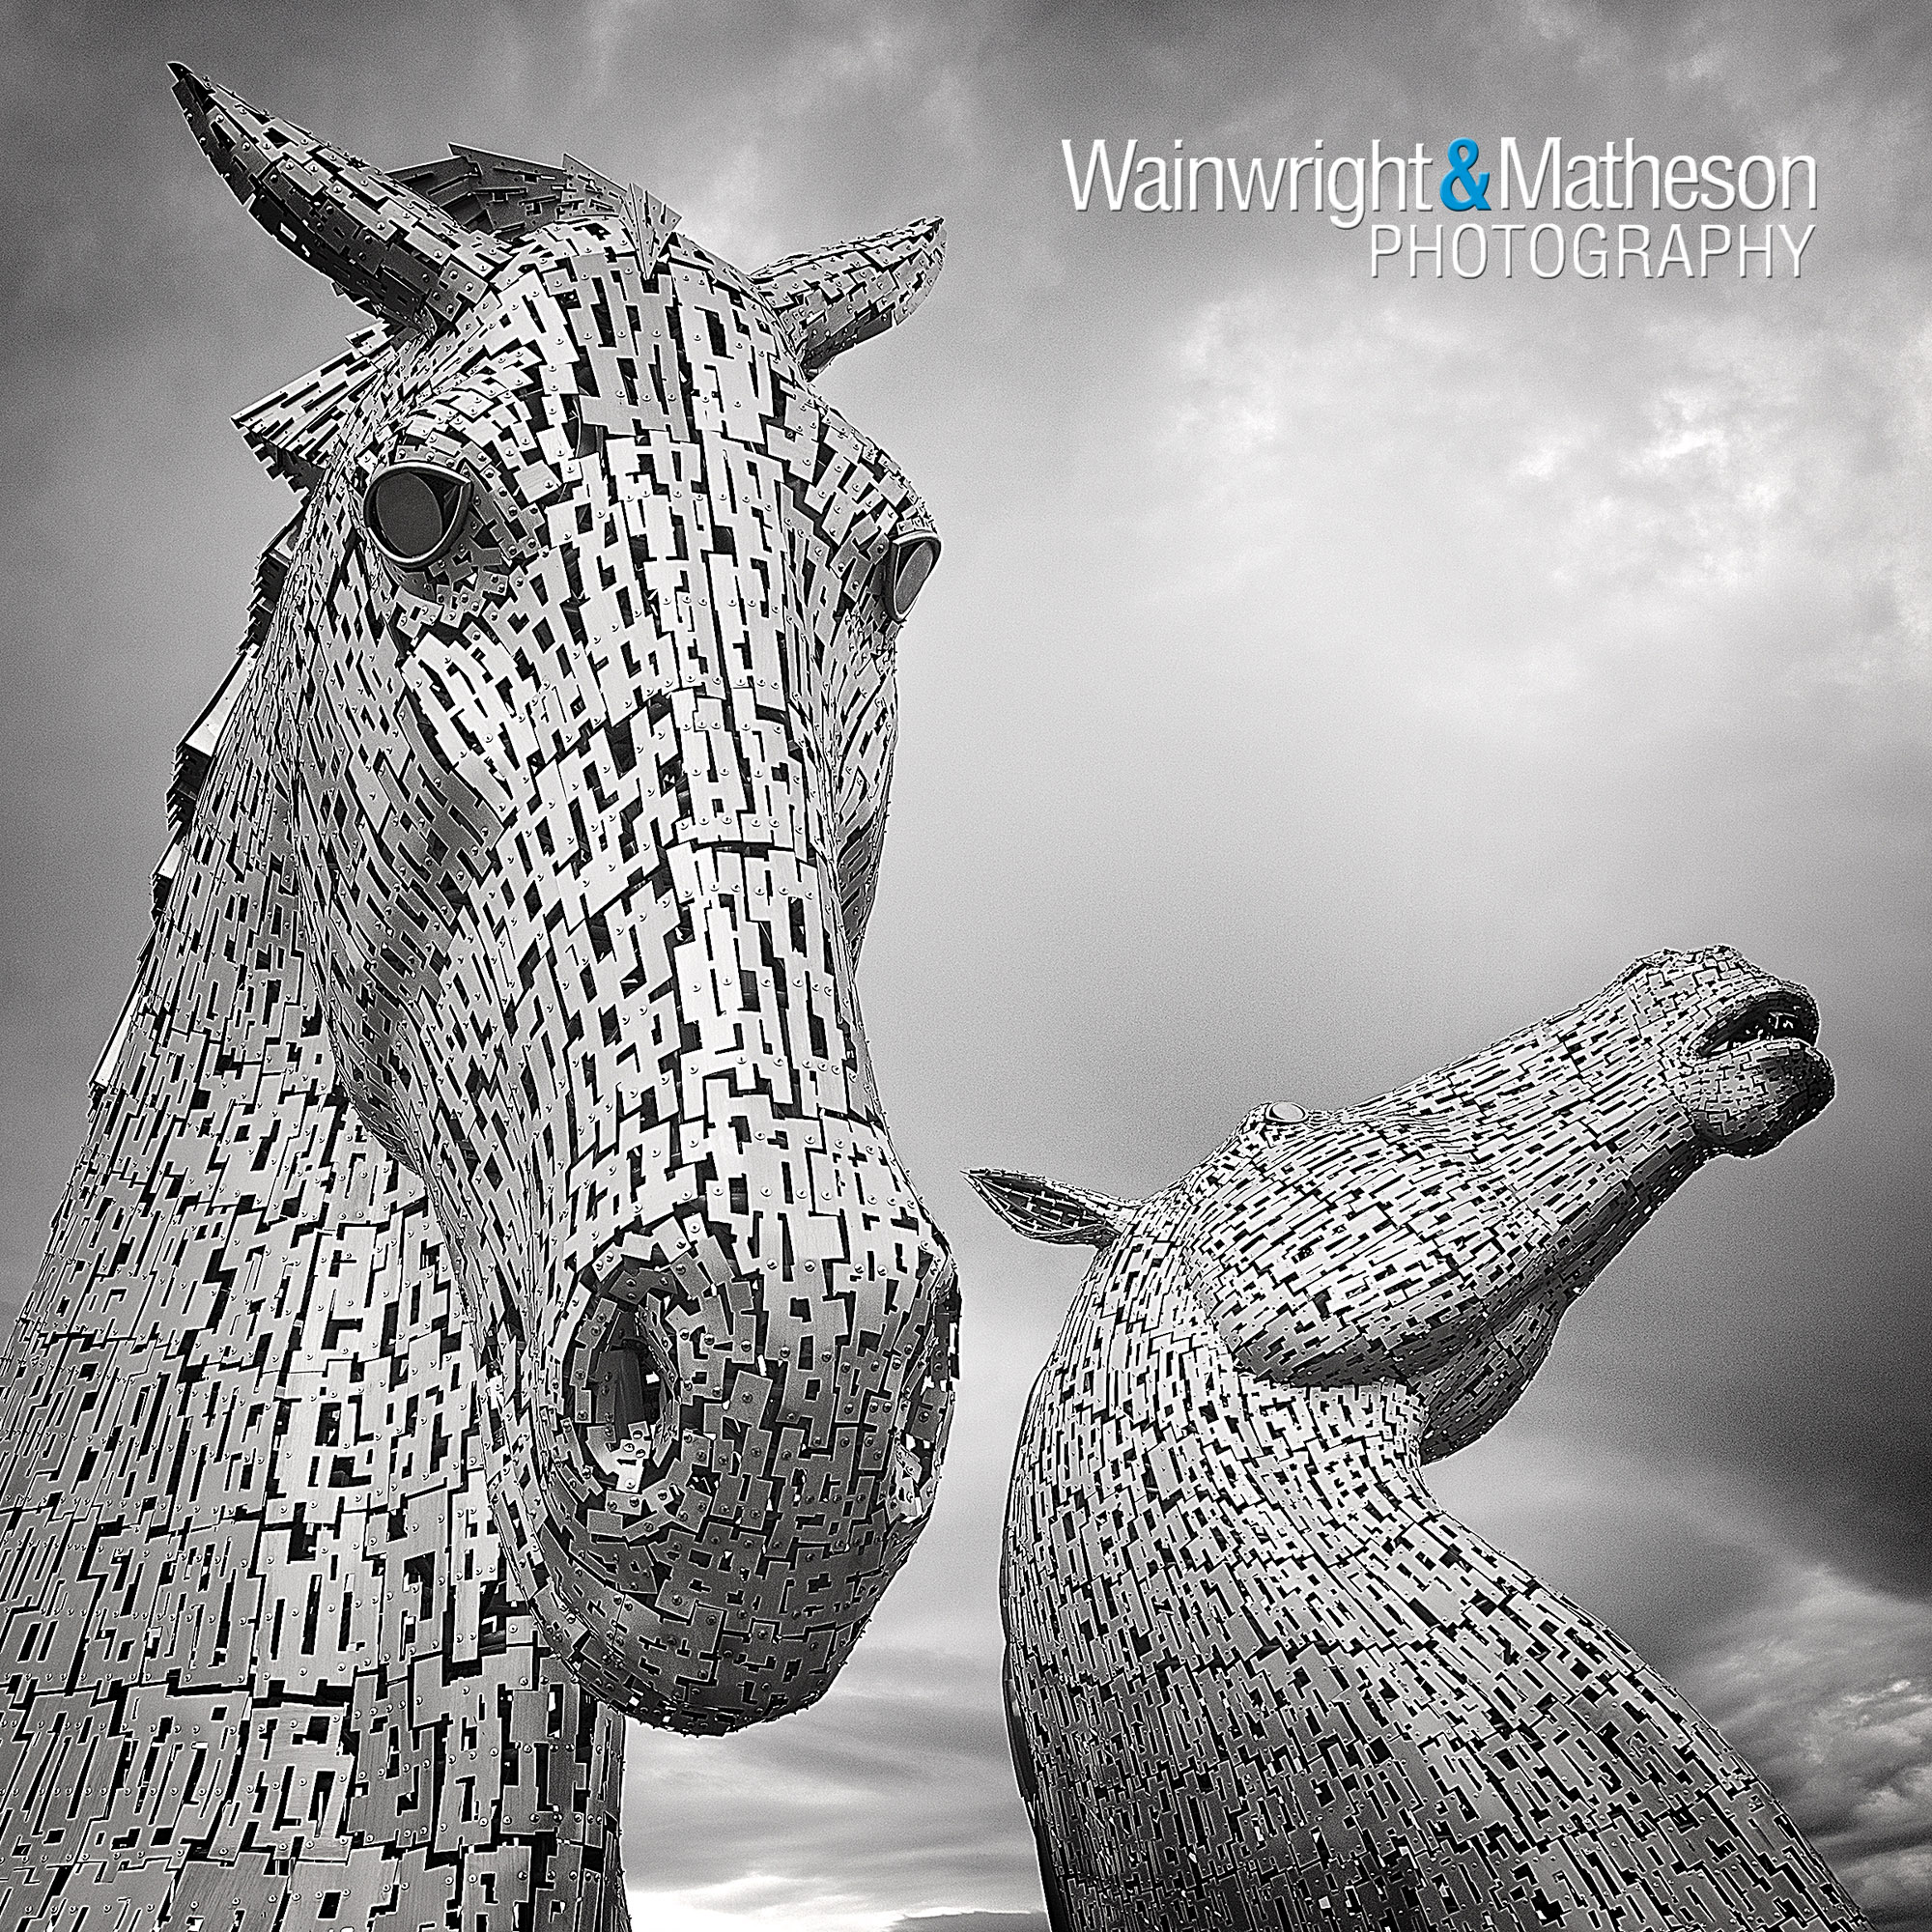 kelpie sculpture Scotland Falkirk